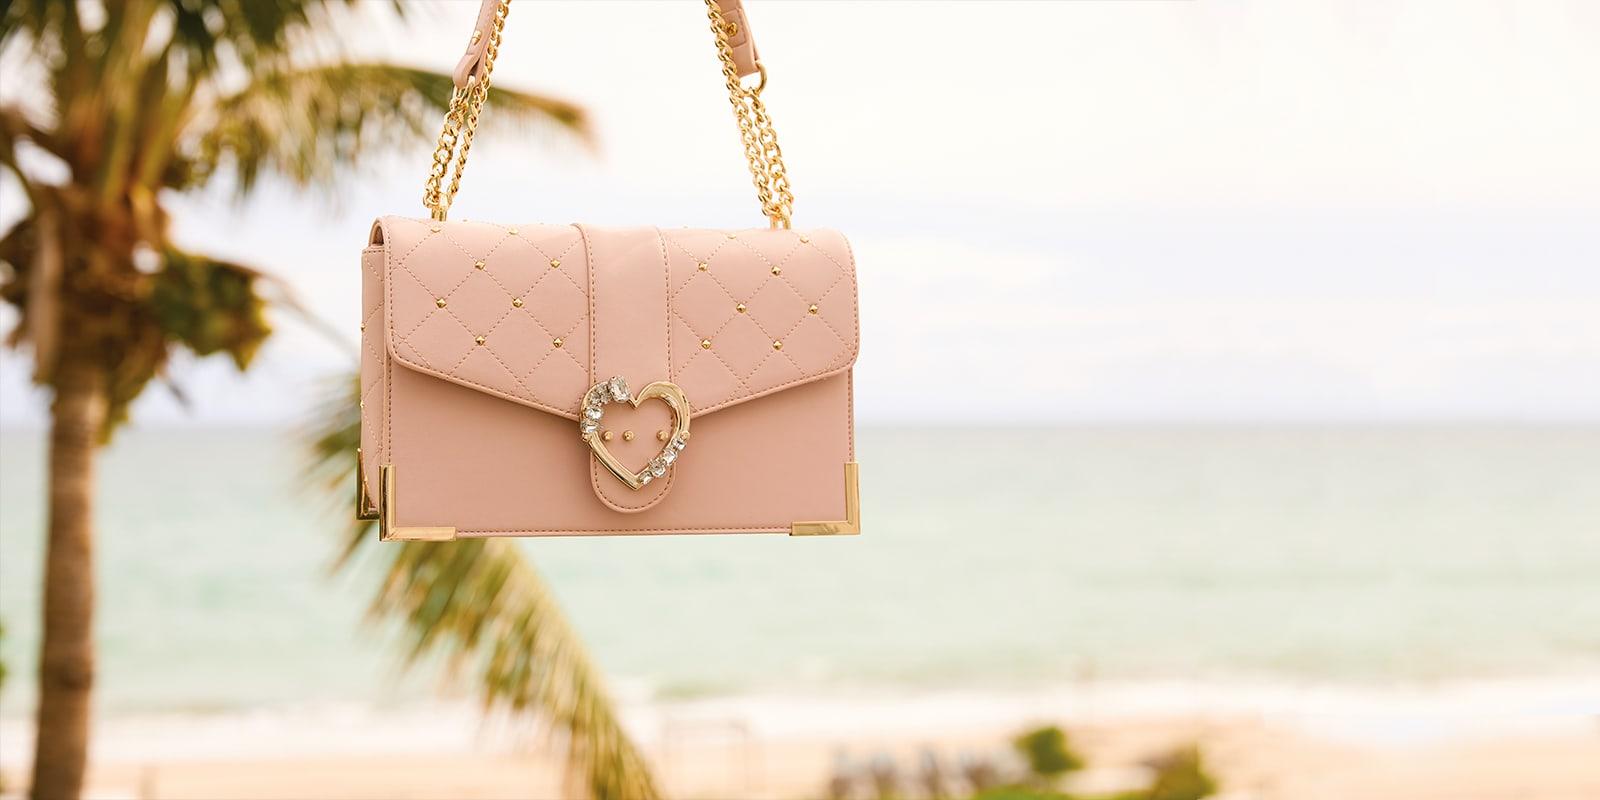 Motivi Iconic bag